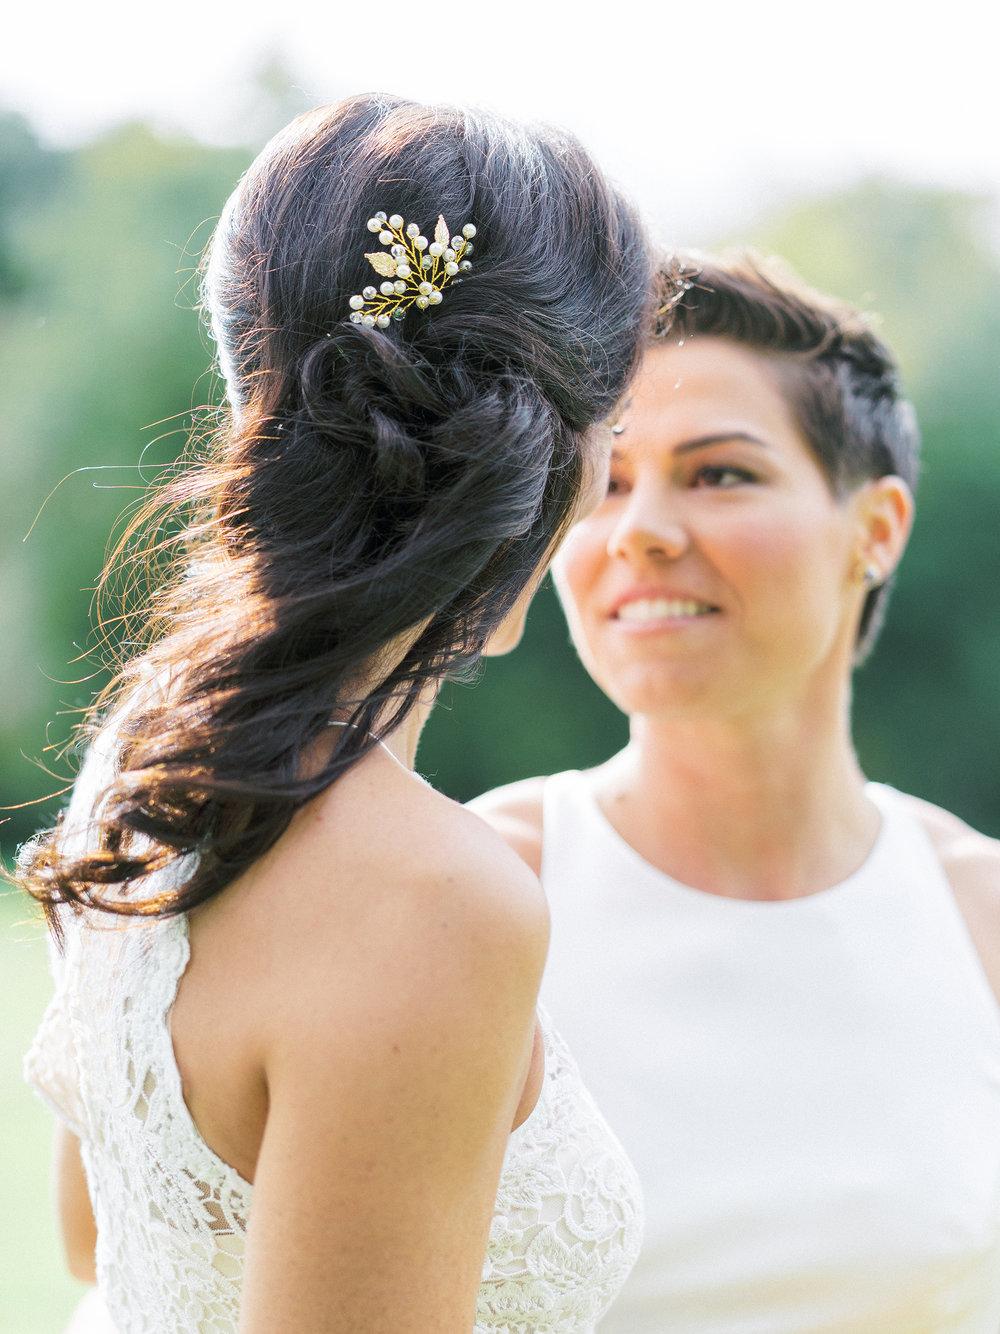 hannah-cochran-photography-kate-and-deb-wedding-01389.jpg